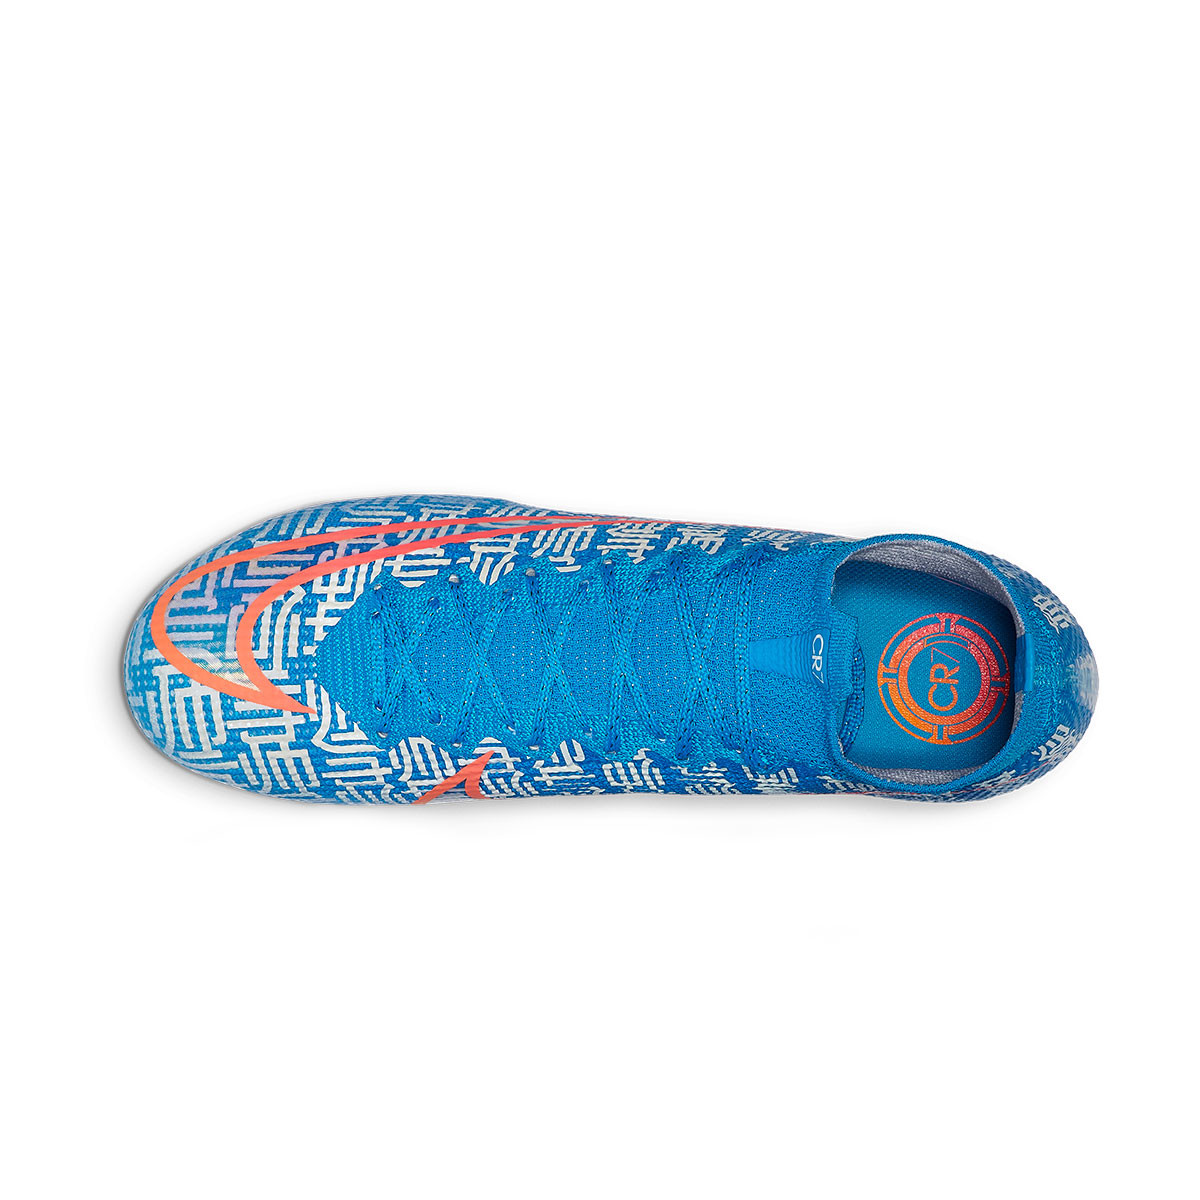 Bota Nike Superfly VII Elite CR7 Shuai FG